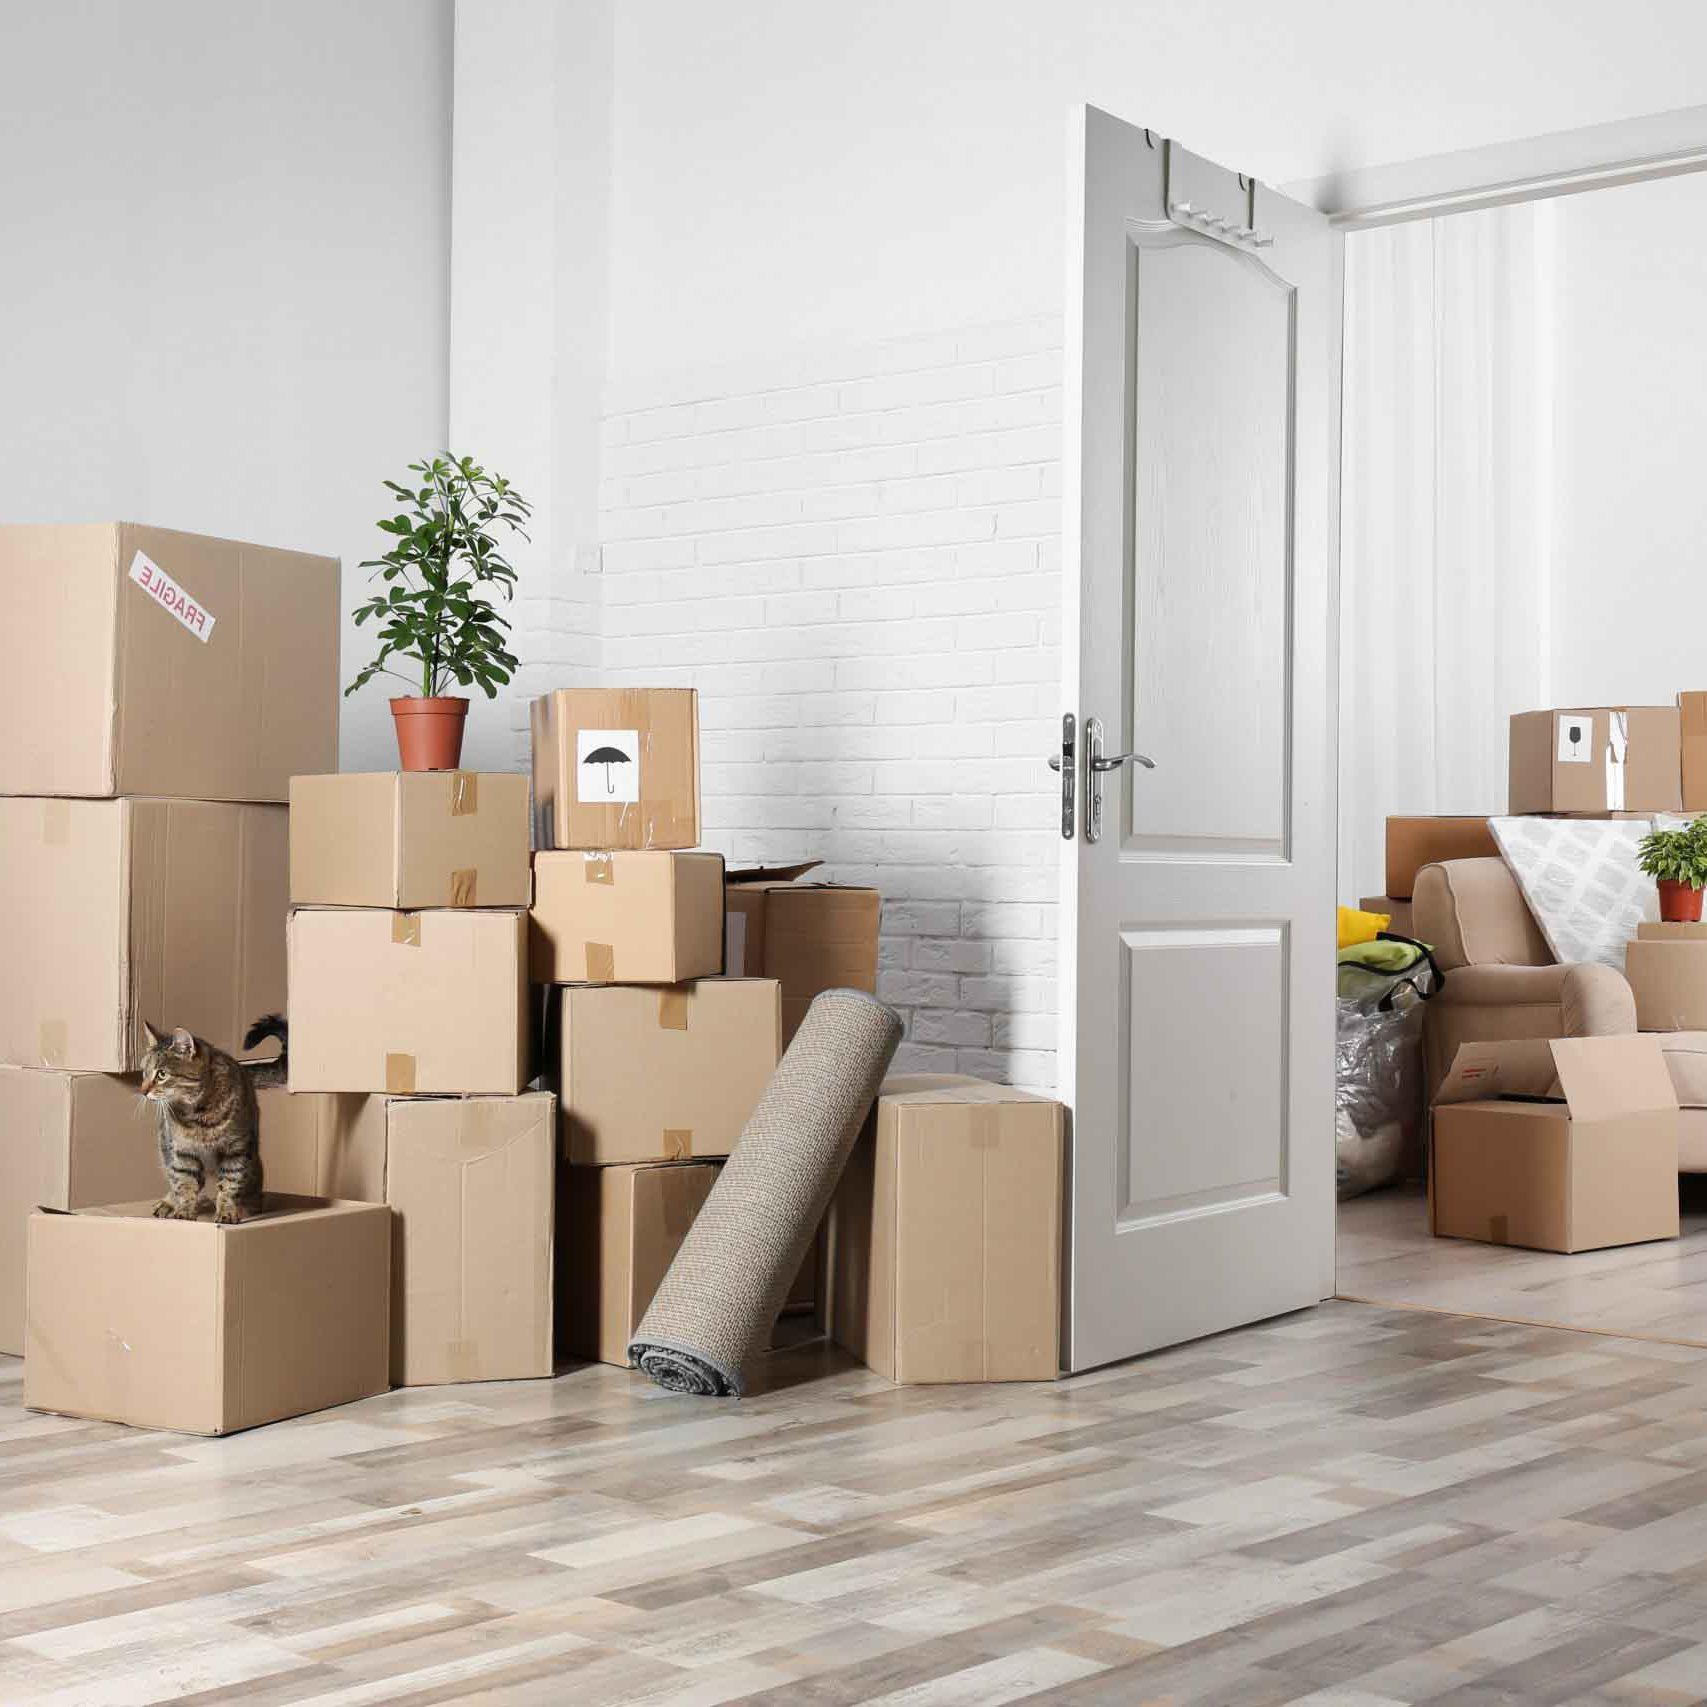 home movers Houston